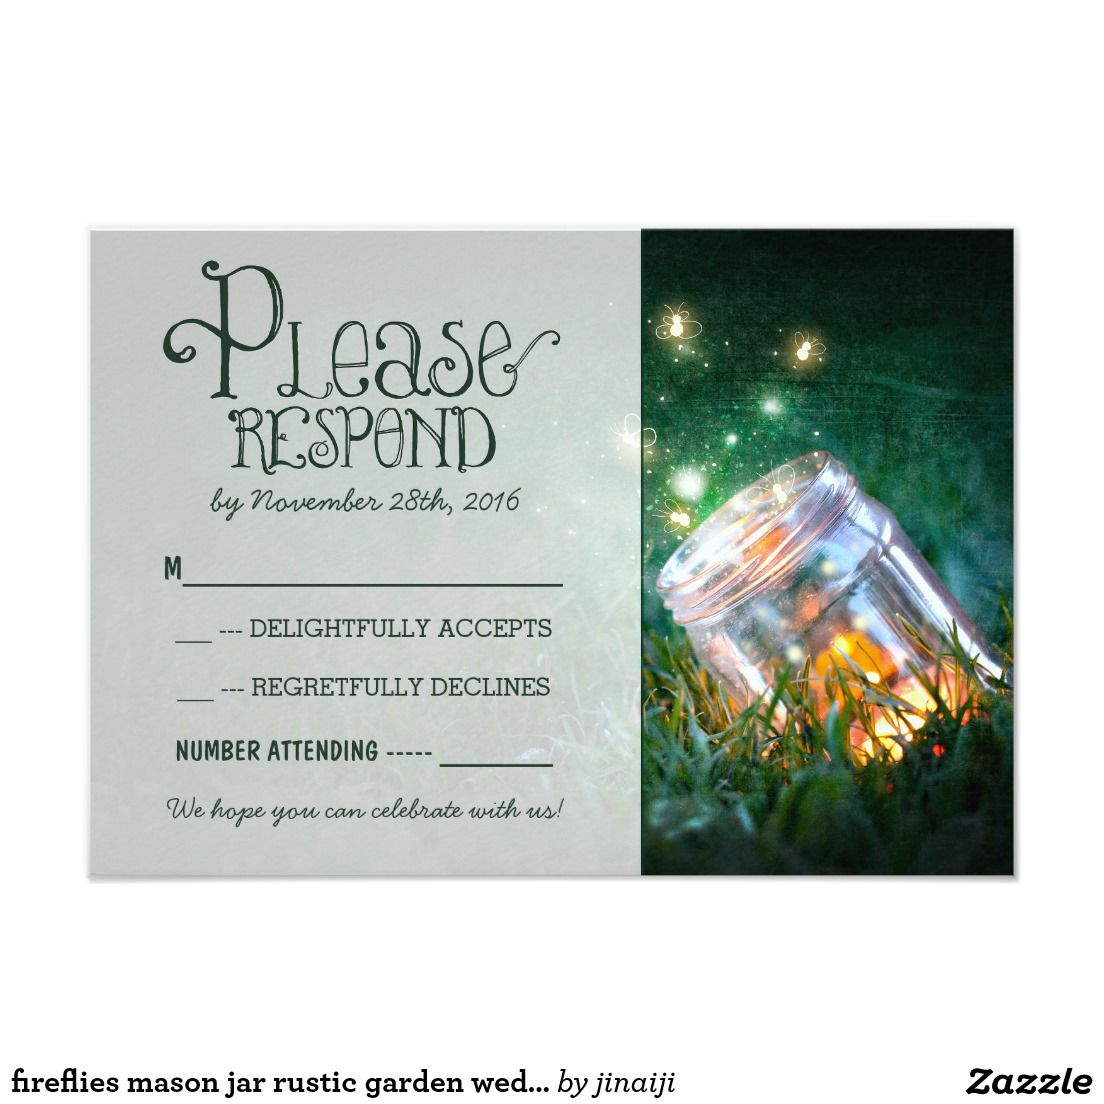 fireflies mason jar rustic garden wedding RSVP Card | Firefly mason ...